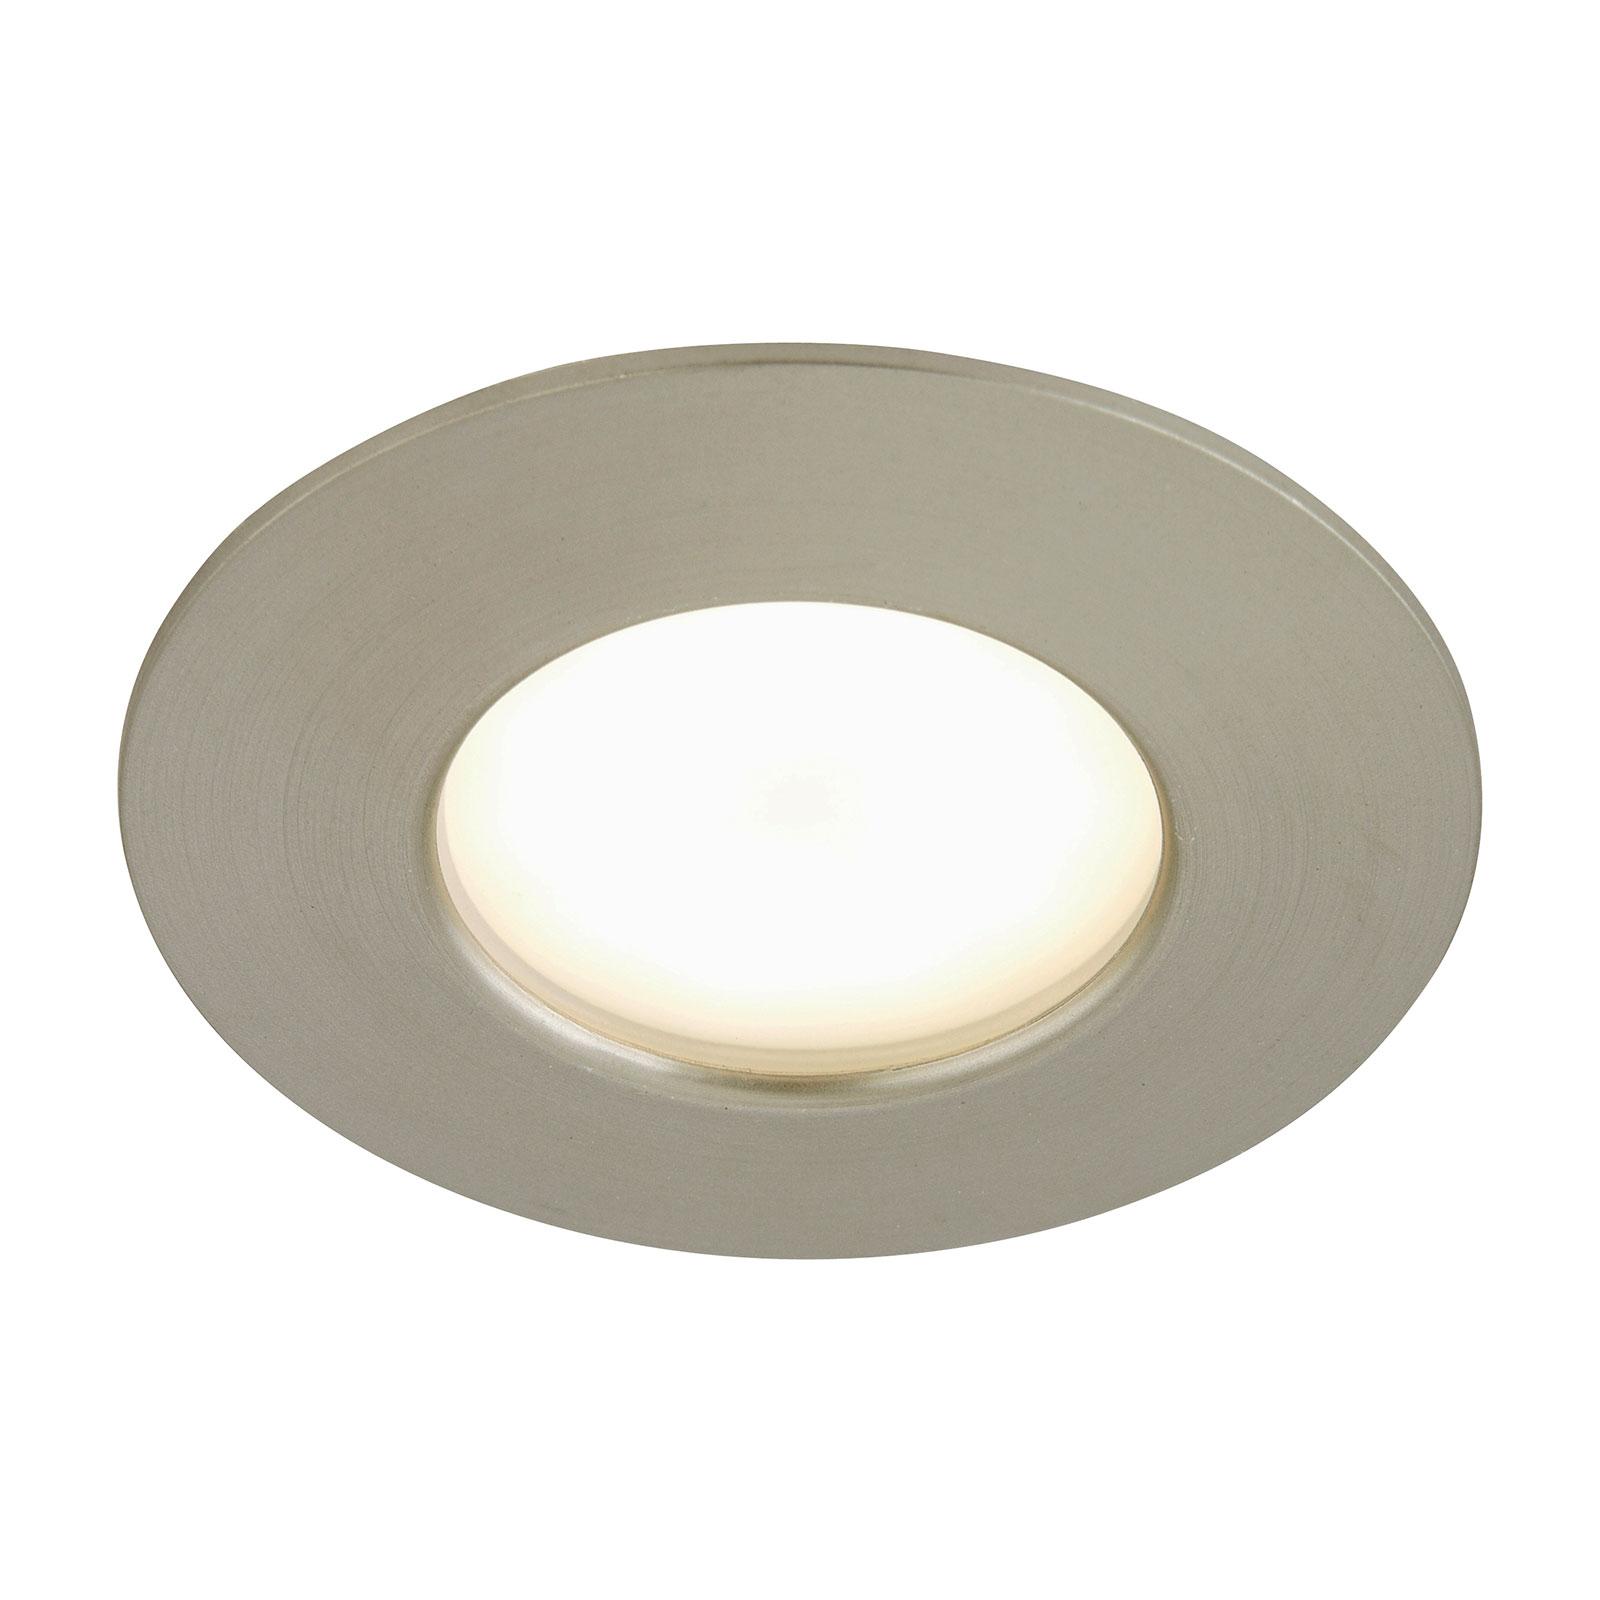 LED inbouwlamp Till voor buiten, mat nikkel